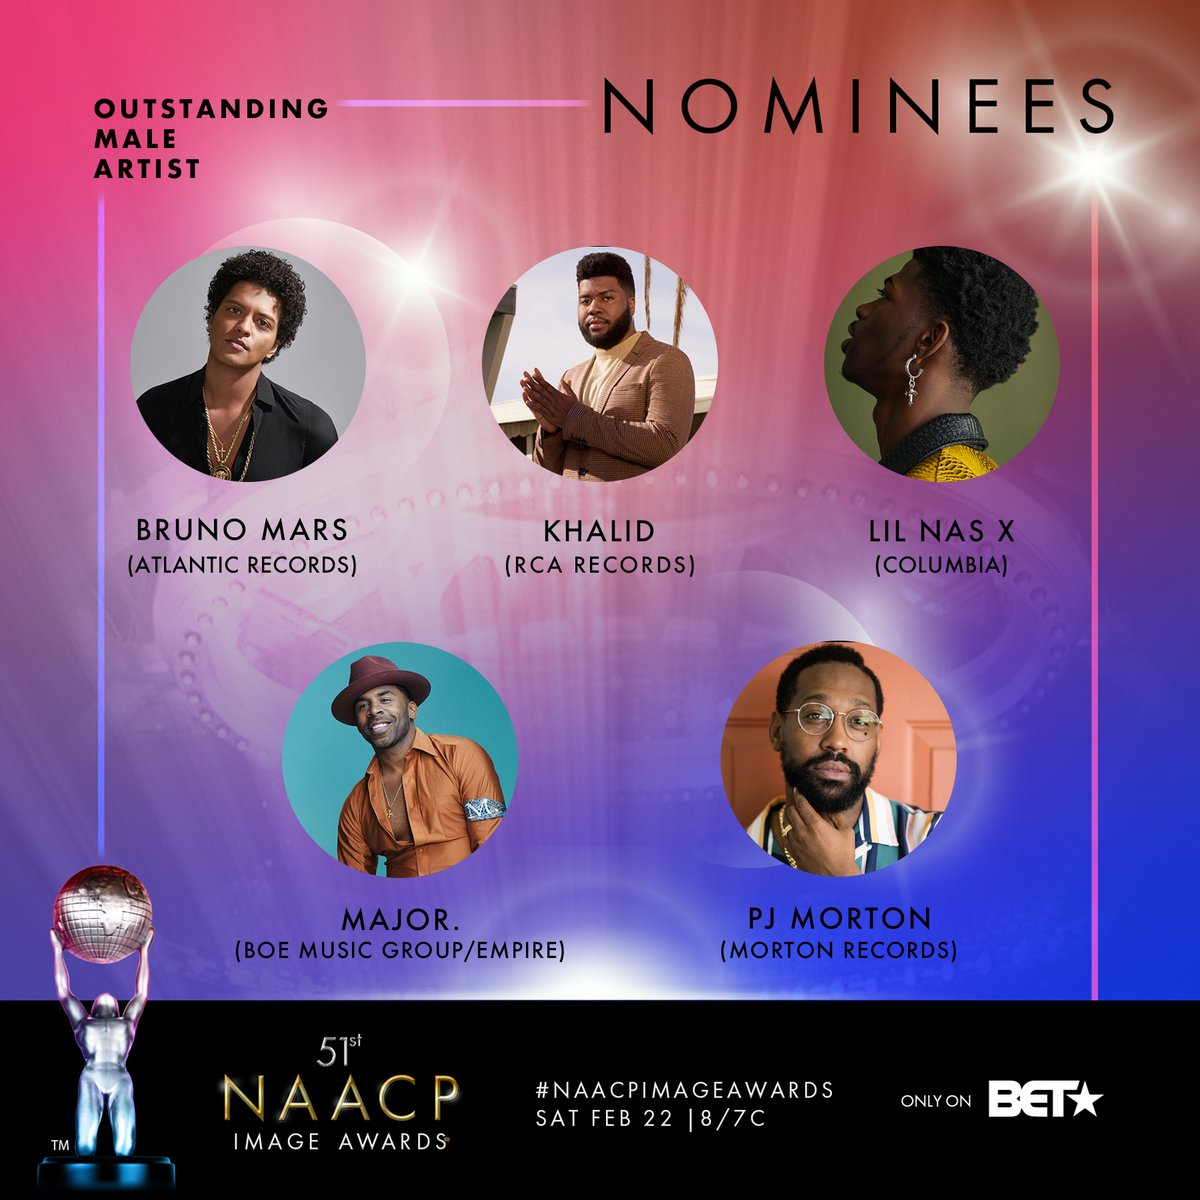 Nominees for Outstanding Male Artist are @BrunoMars, @thegreatkhalid, @LilNasX, @nowthatsMAJOR, and  @PJMORTON #NAACPImageAwards